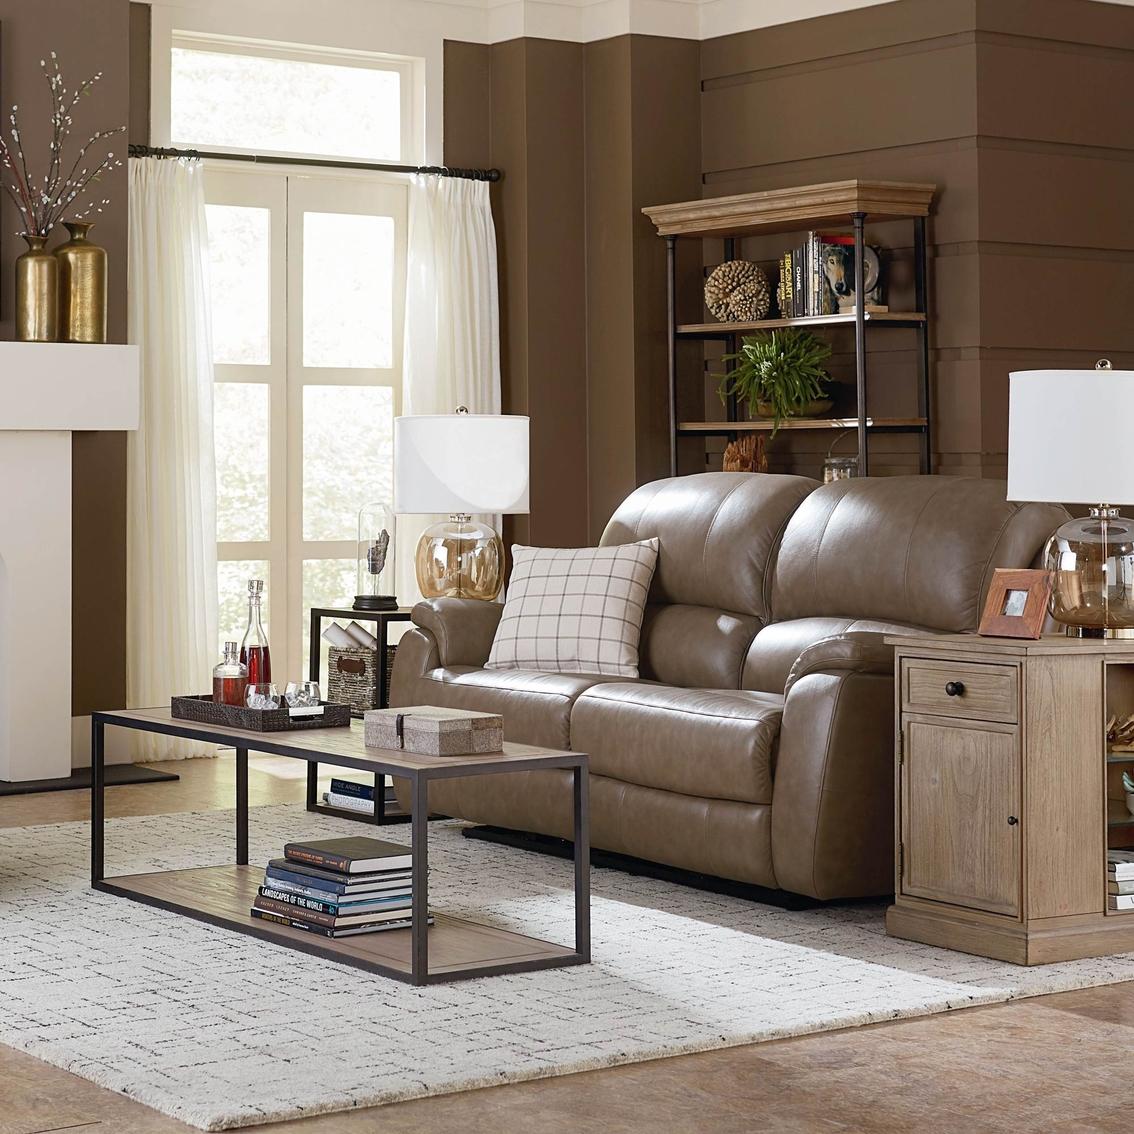 Bassett Godfrey Motion Sofa | Sofas & Couches | Home & Appliances ...